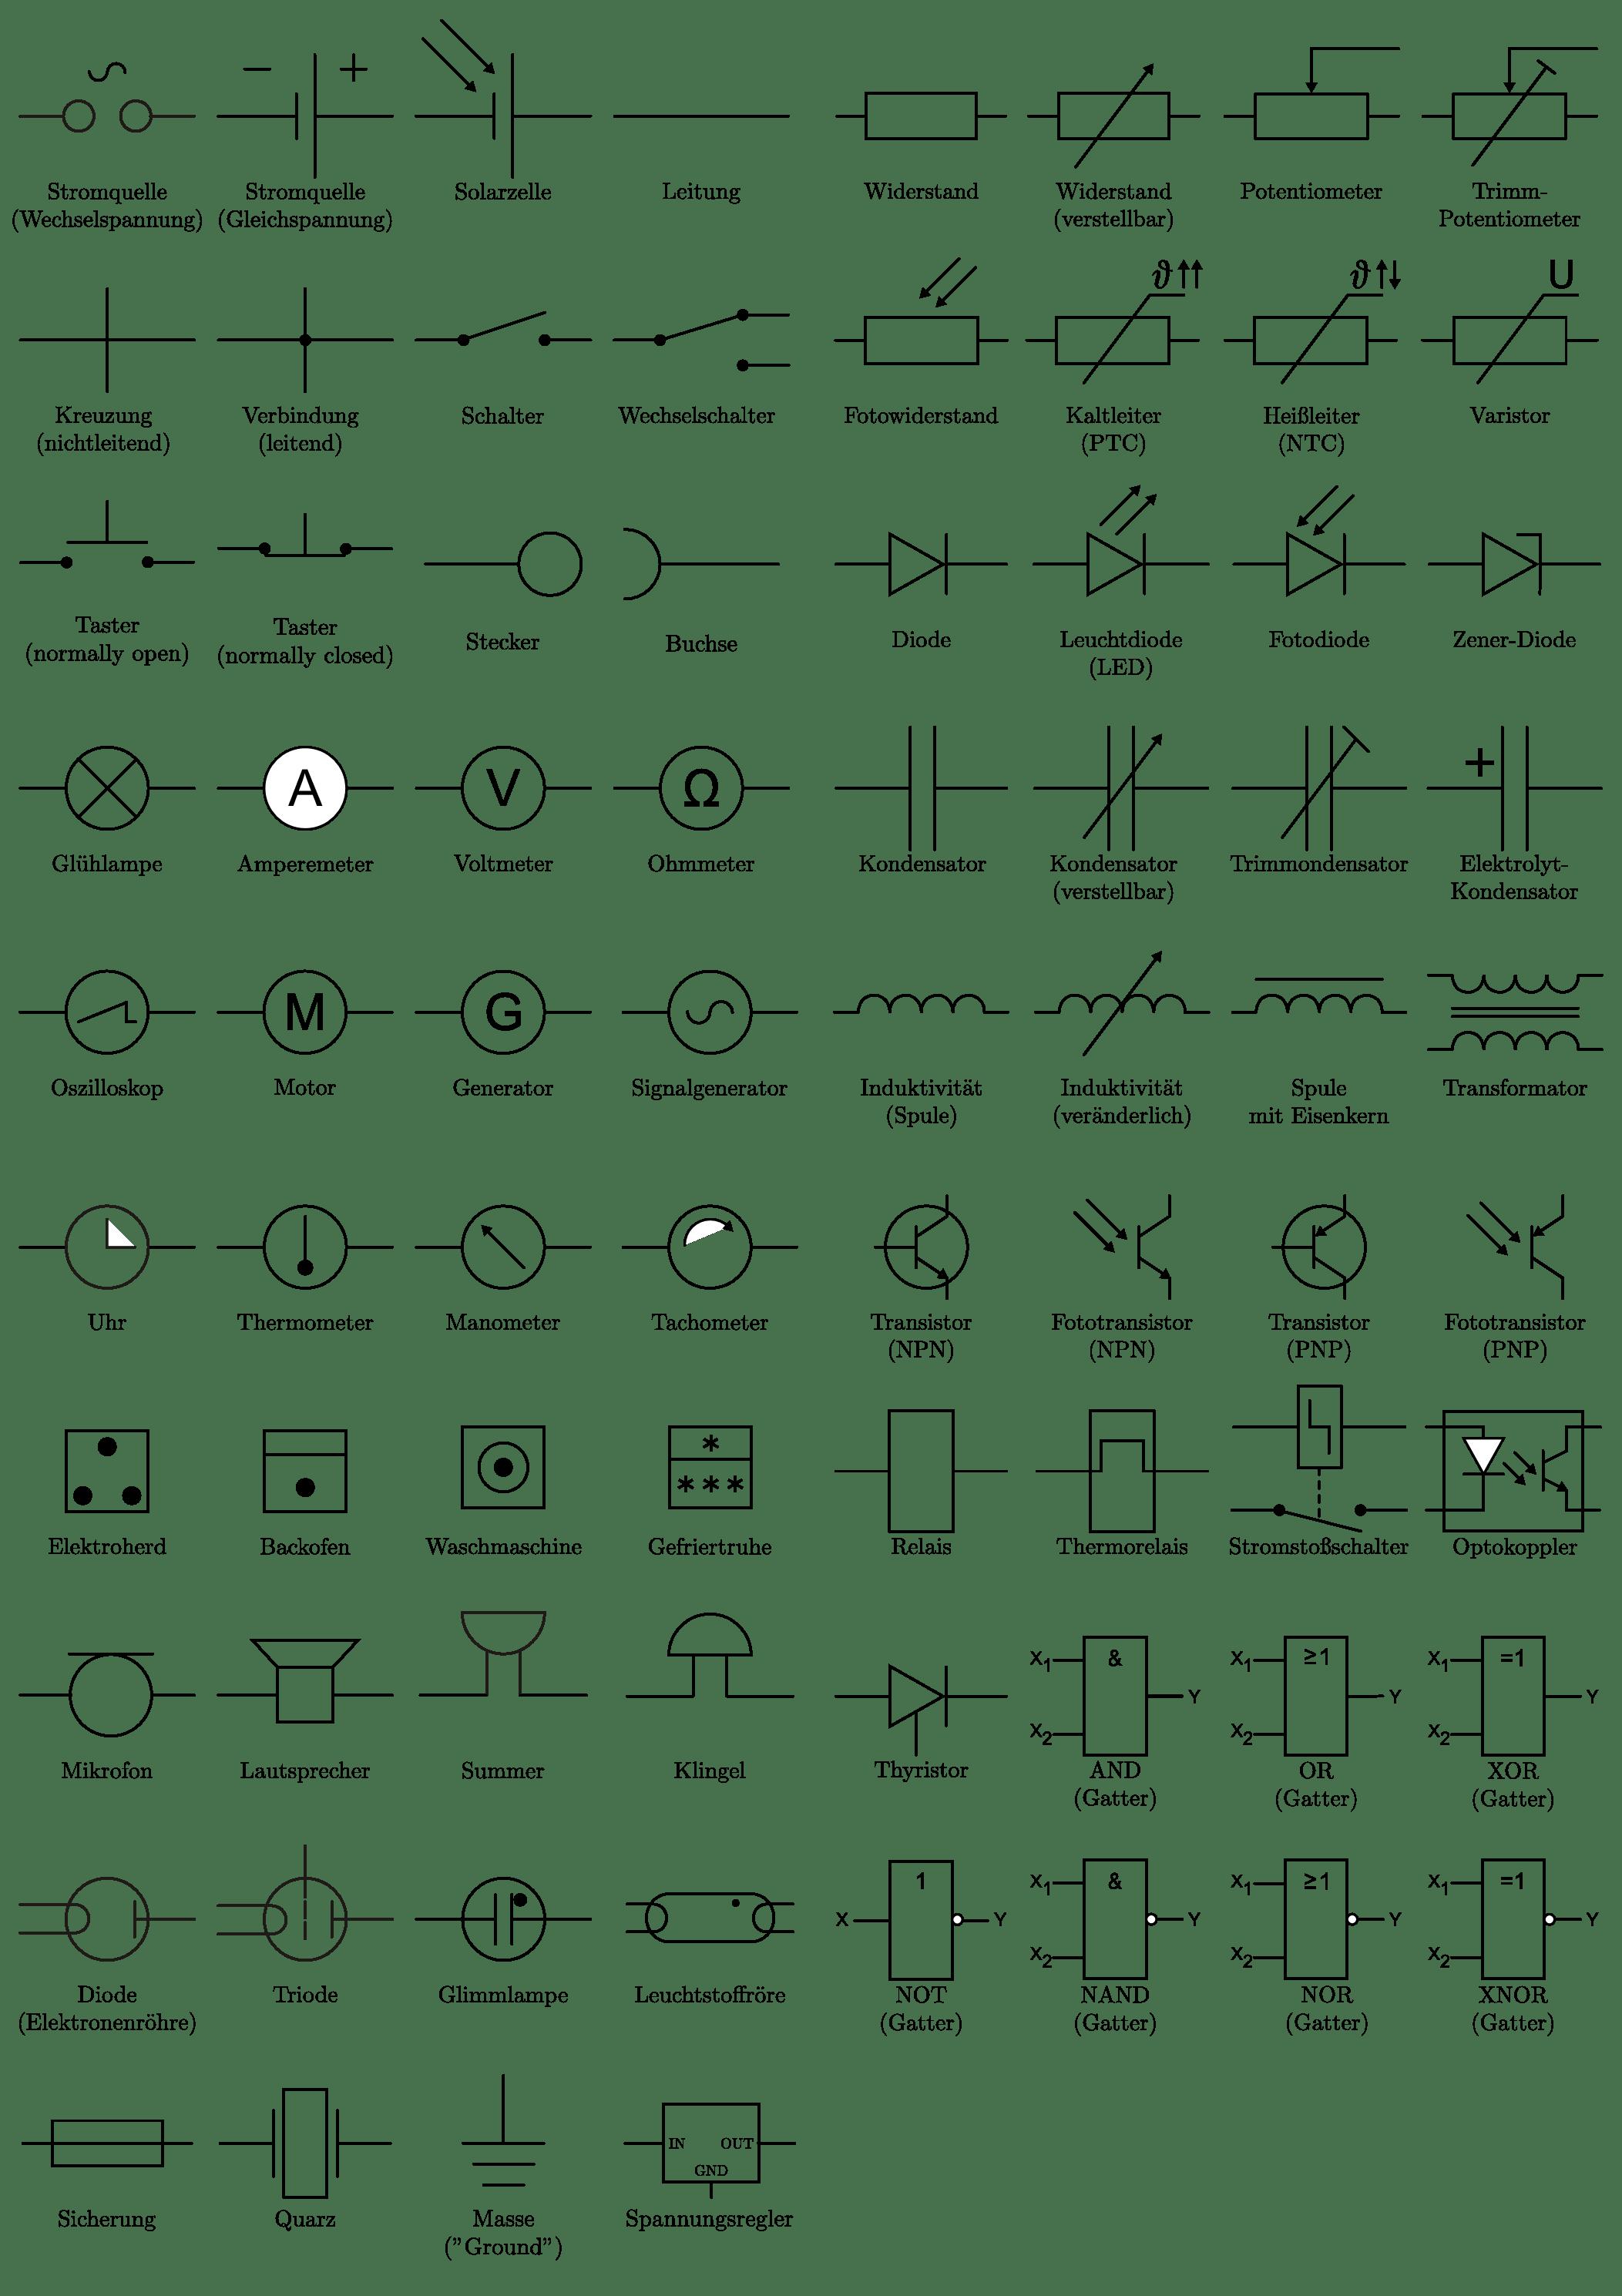 Ubersicht Uber Elektronische Symbole